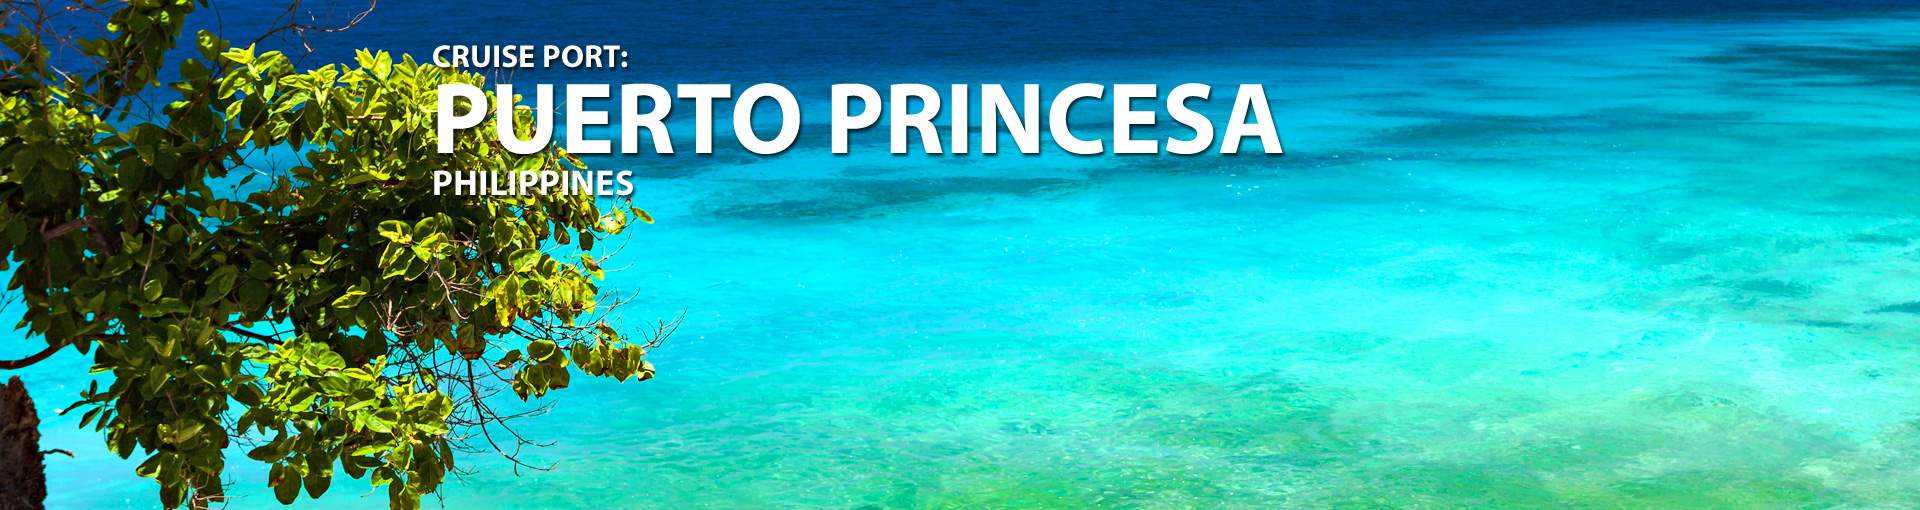 Cruises to Puerto Princesa, Philippines